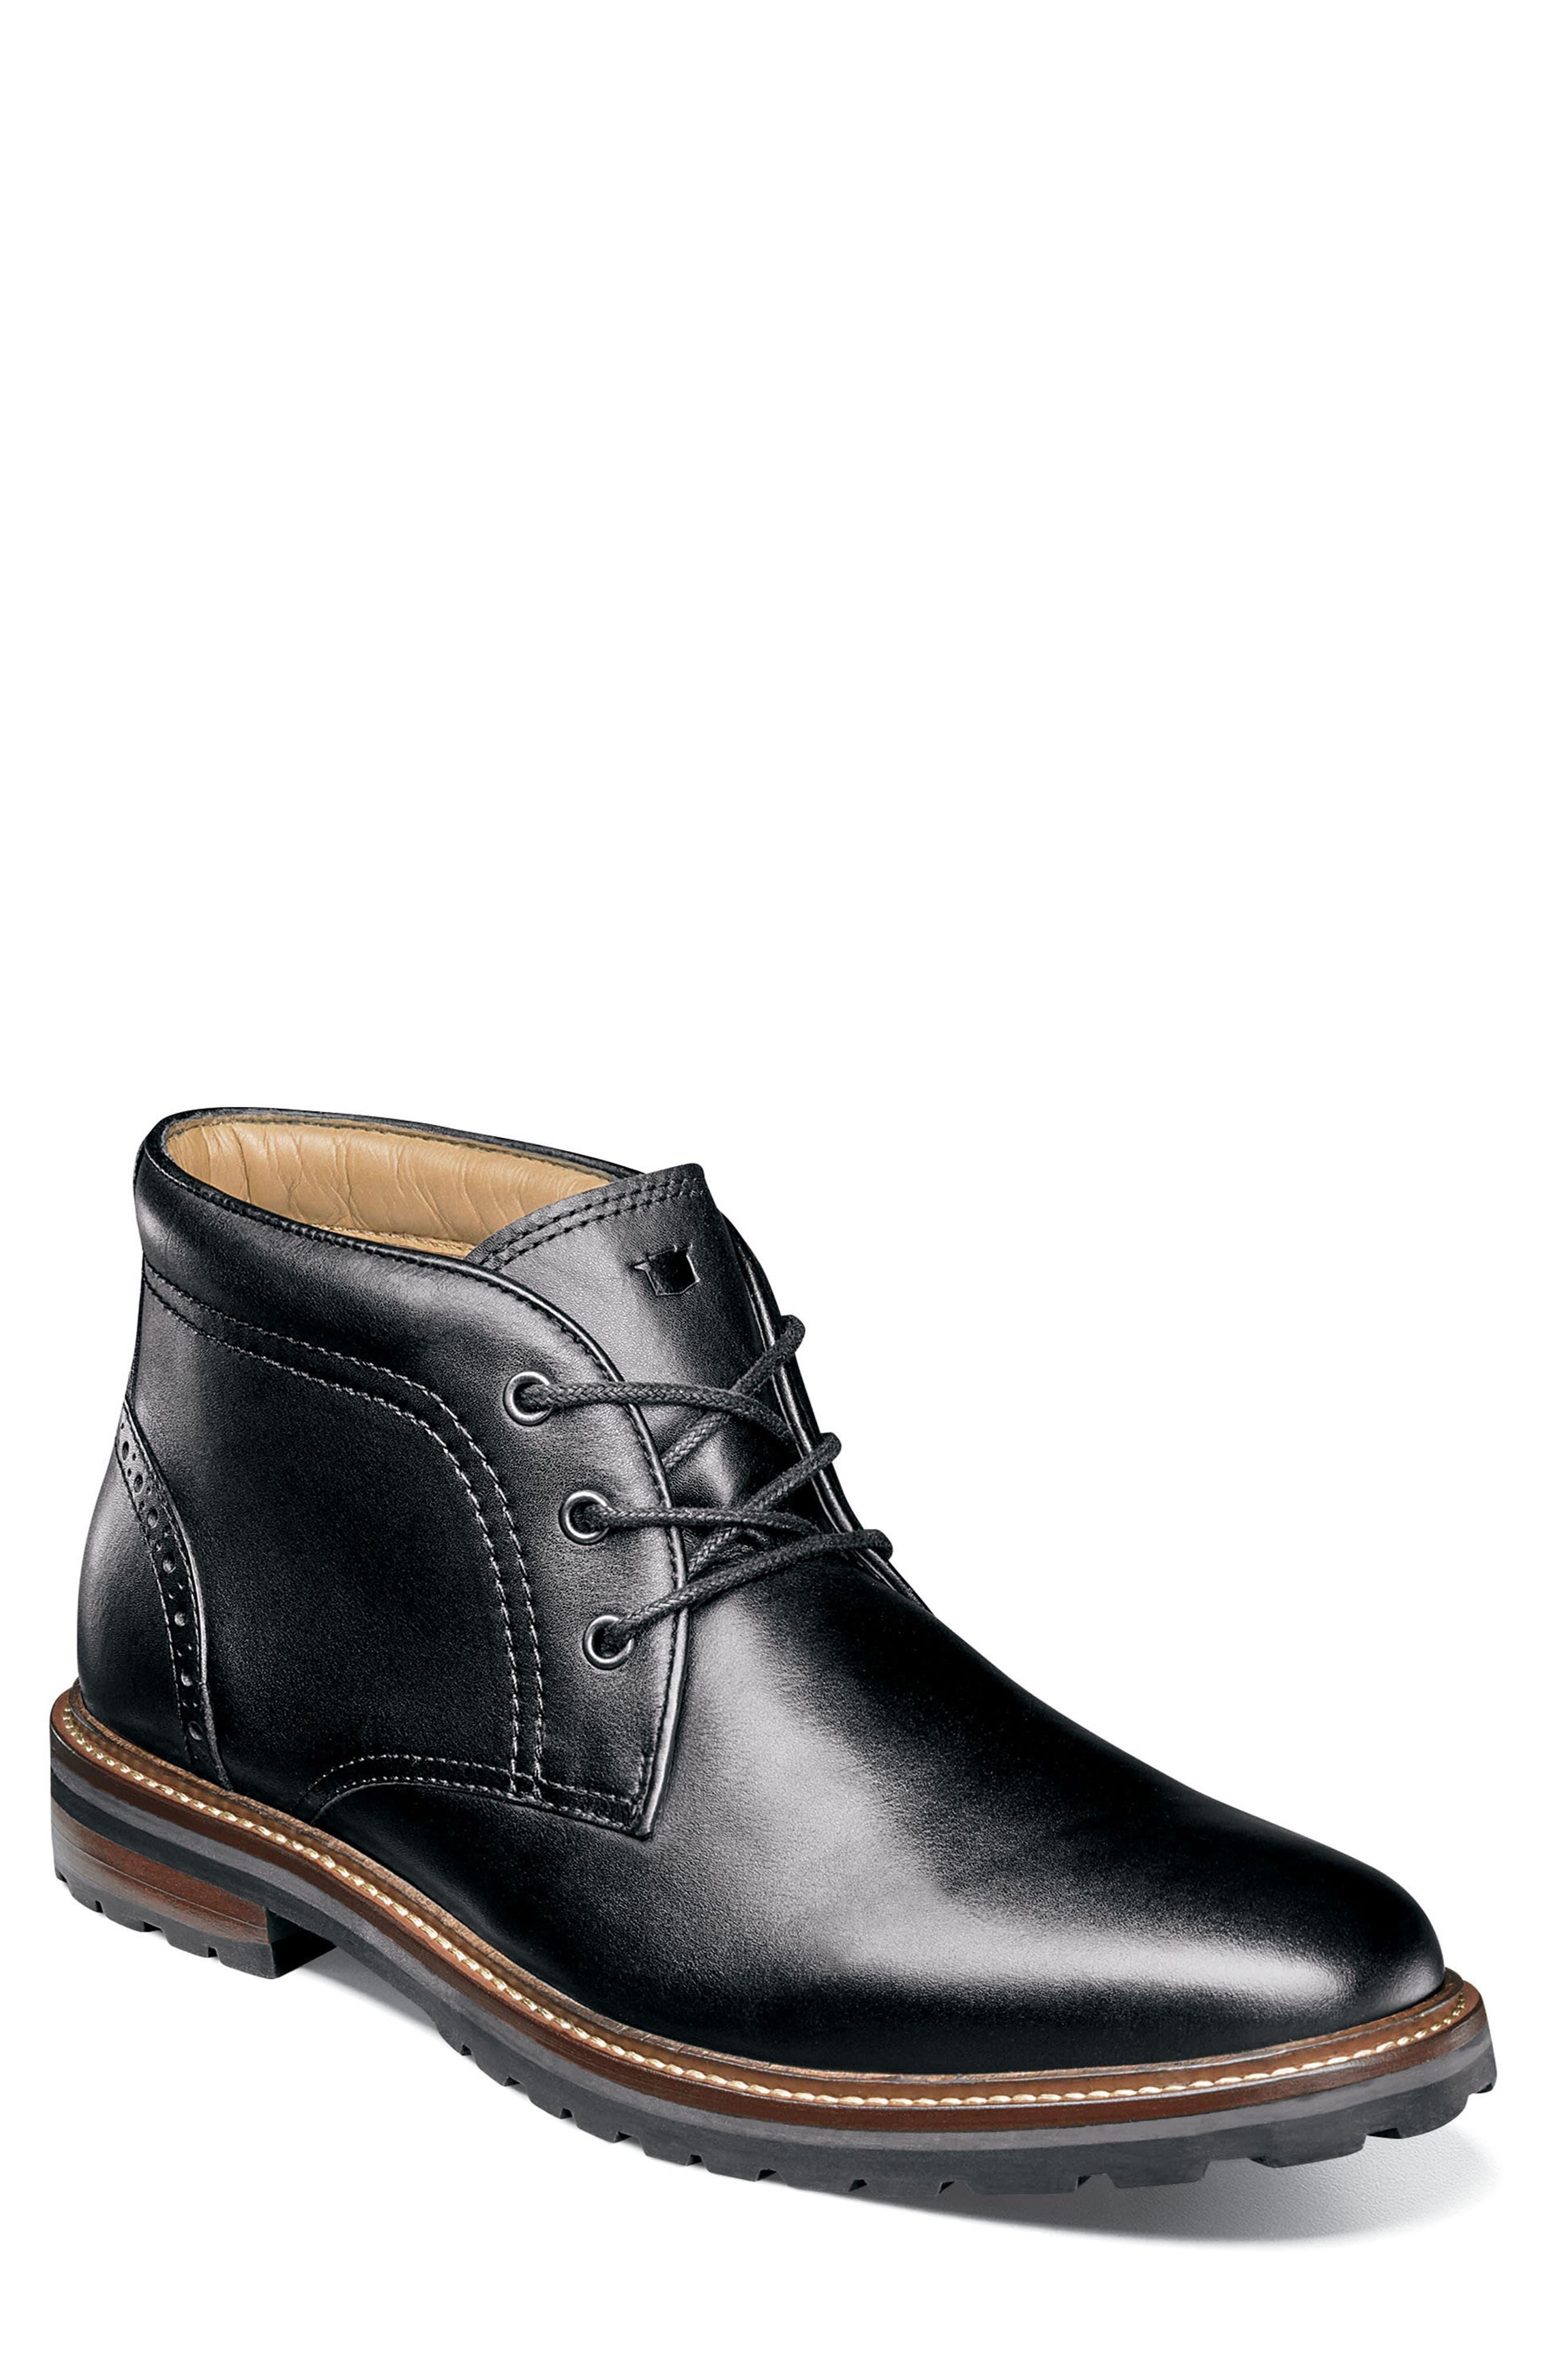 FLORSHEIM, Estabrook Lugged Chukka Boot, Main thumbnail 1, color, BLACK LEATHER